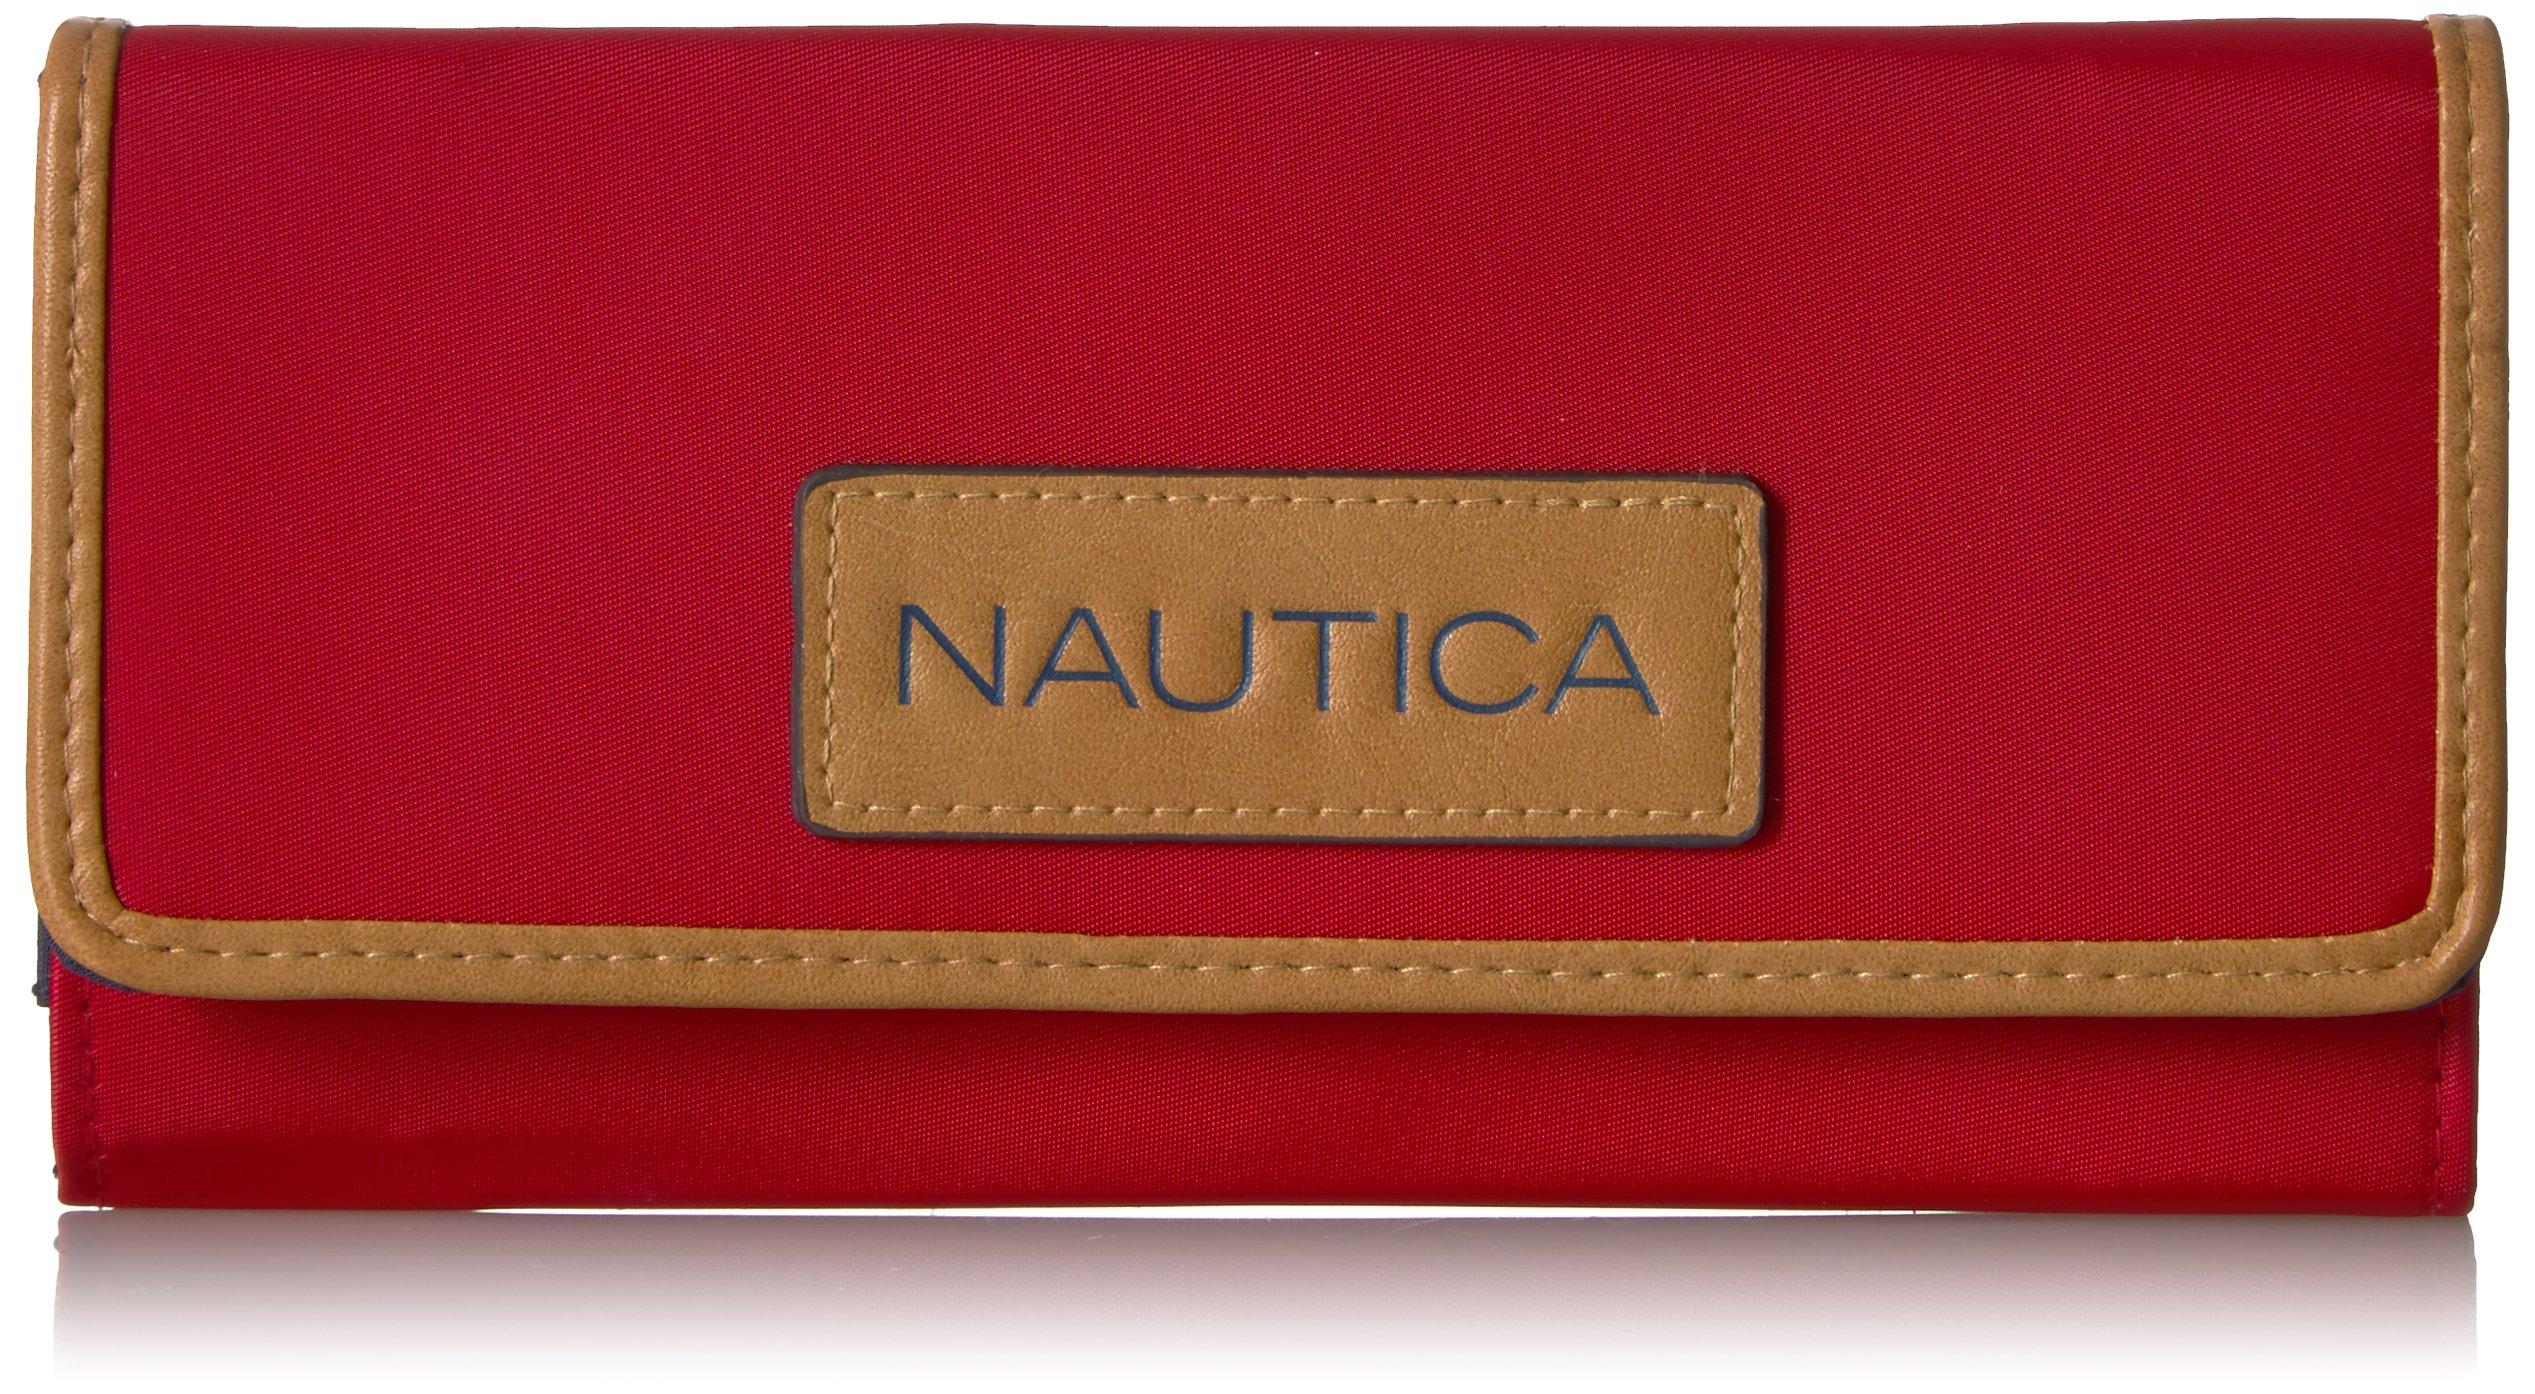 Nauticaパーフェクトキャリーオールマネーマネージャー財布オラガナイザーRFIDブロッキング財布